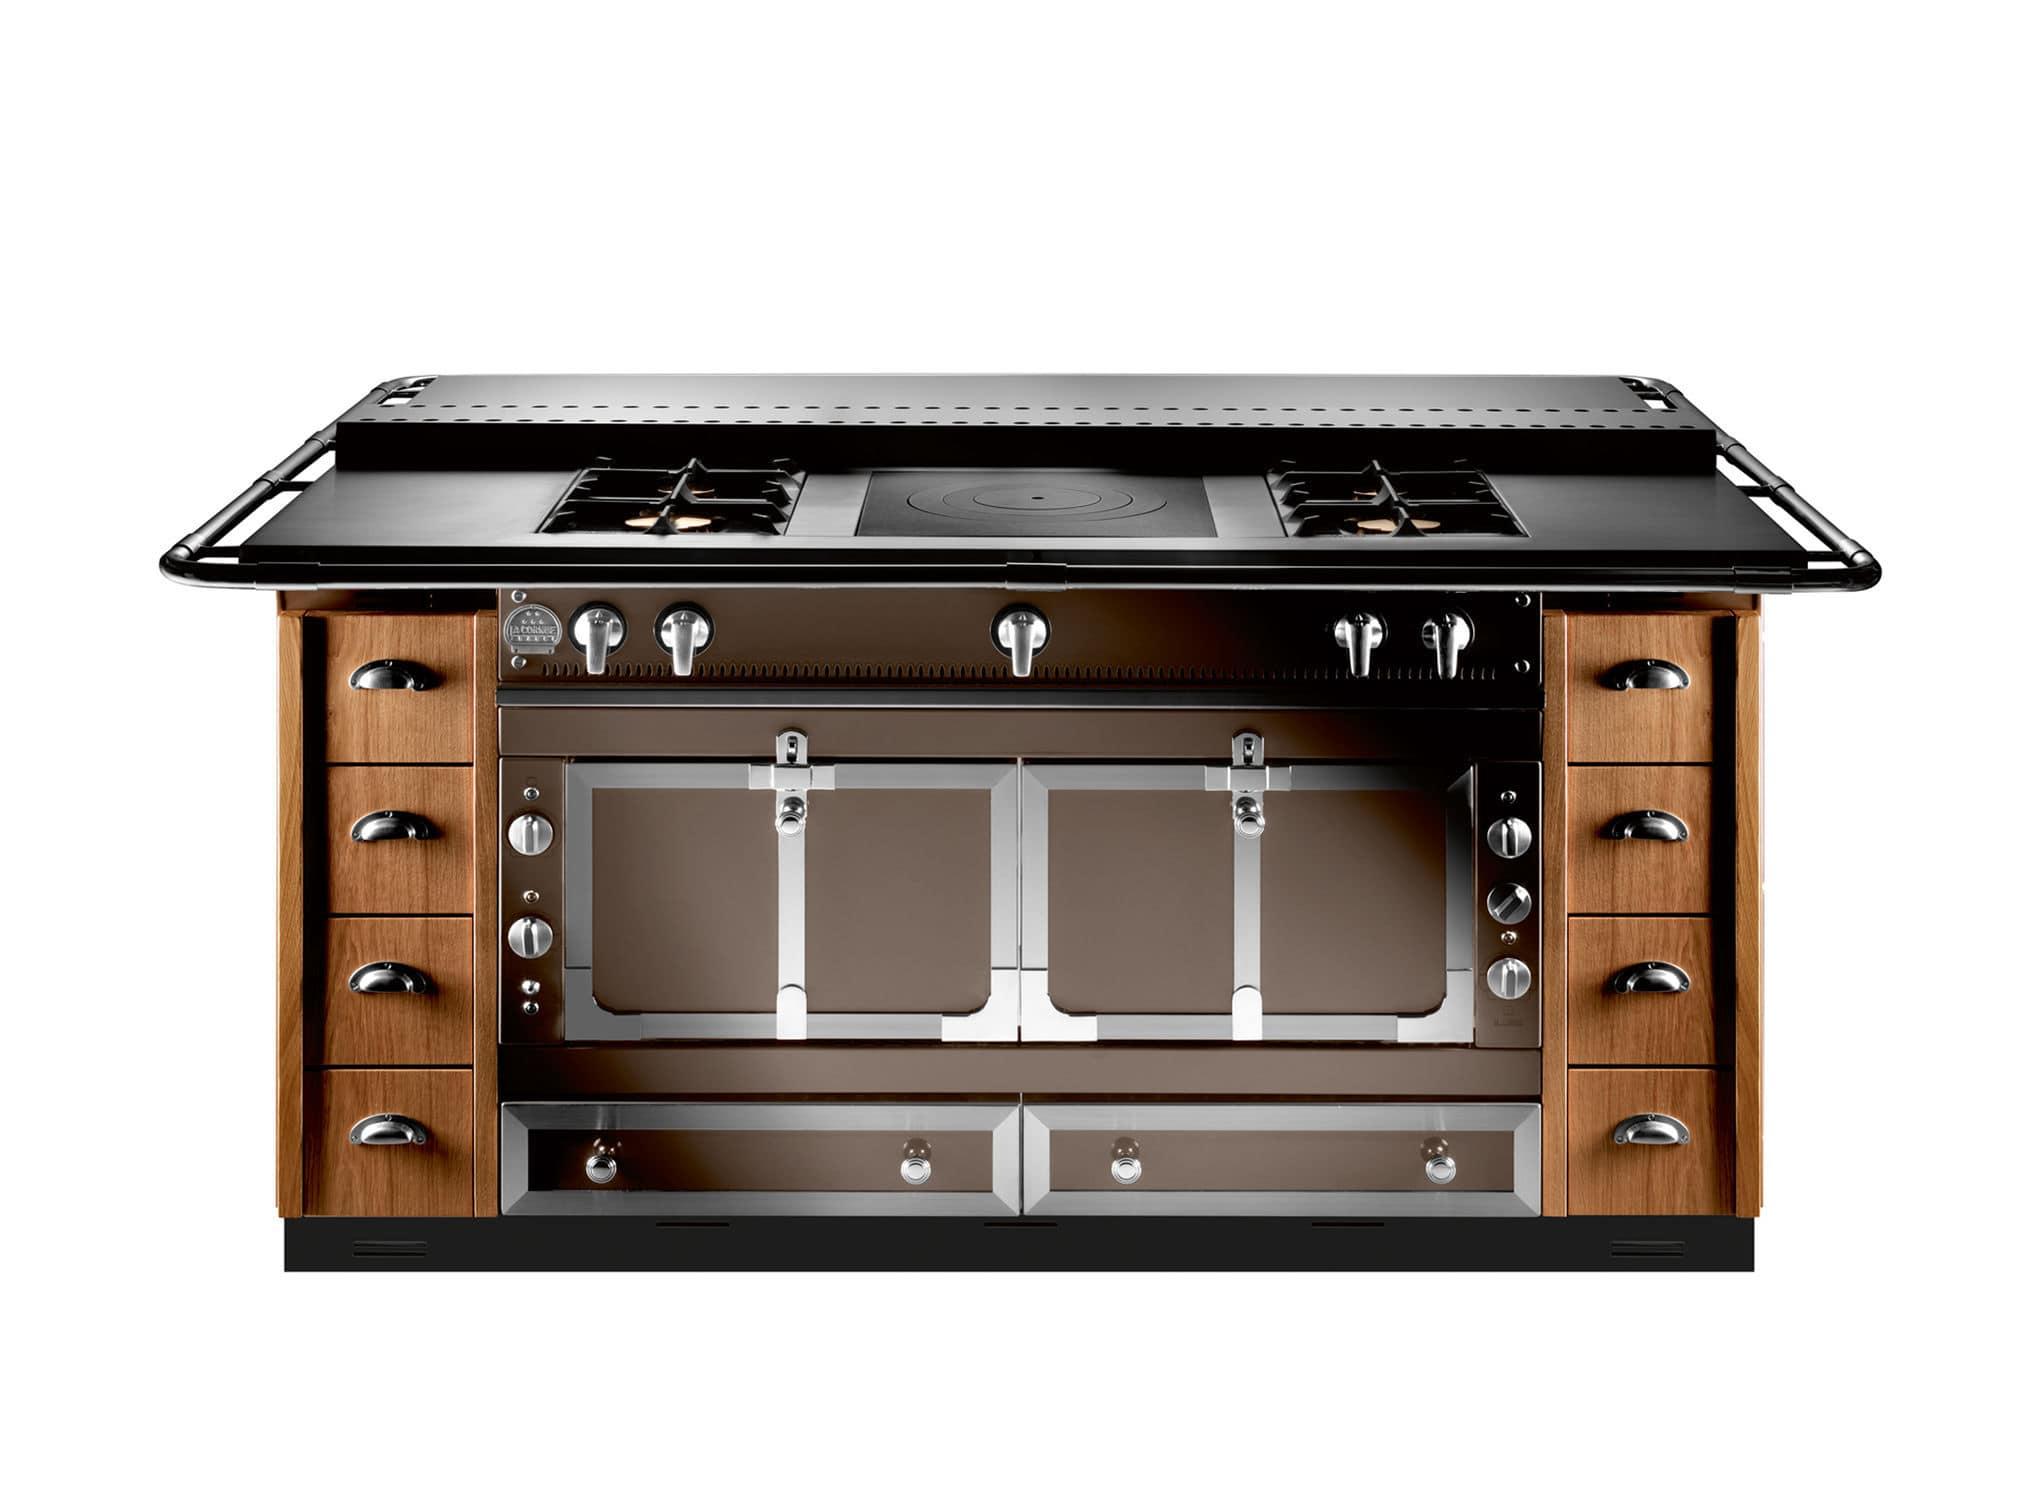 electric kitchen stove antique hutch 燃气厨房灶具 电动 混合型 不锈钢 le chateau 120 la cornue